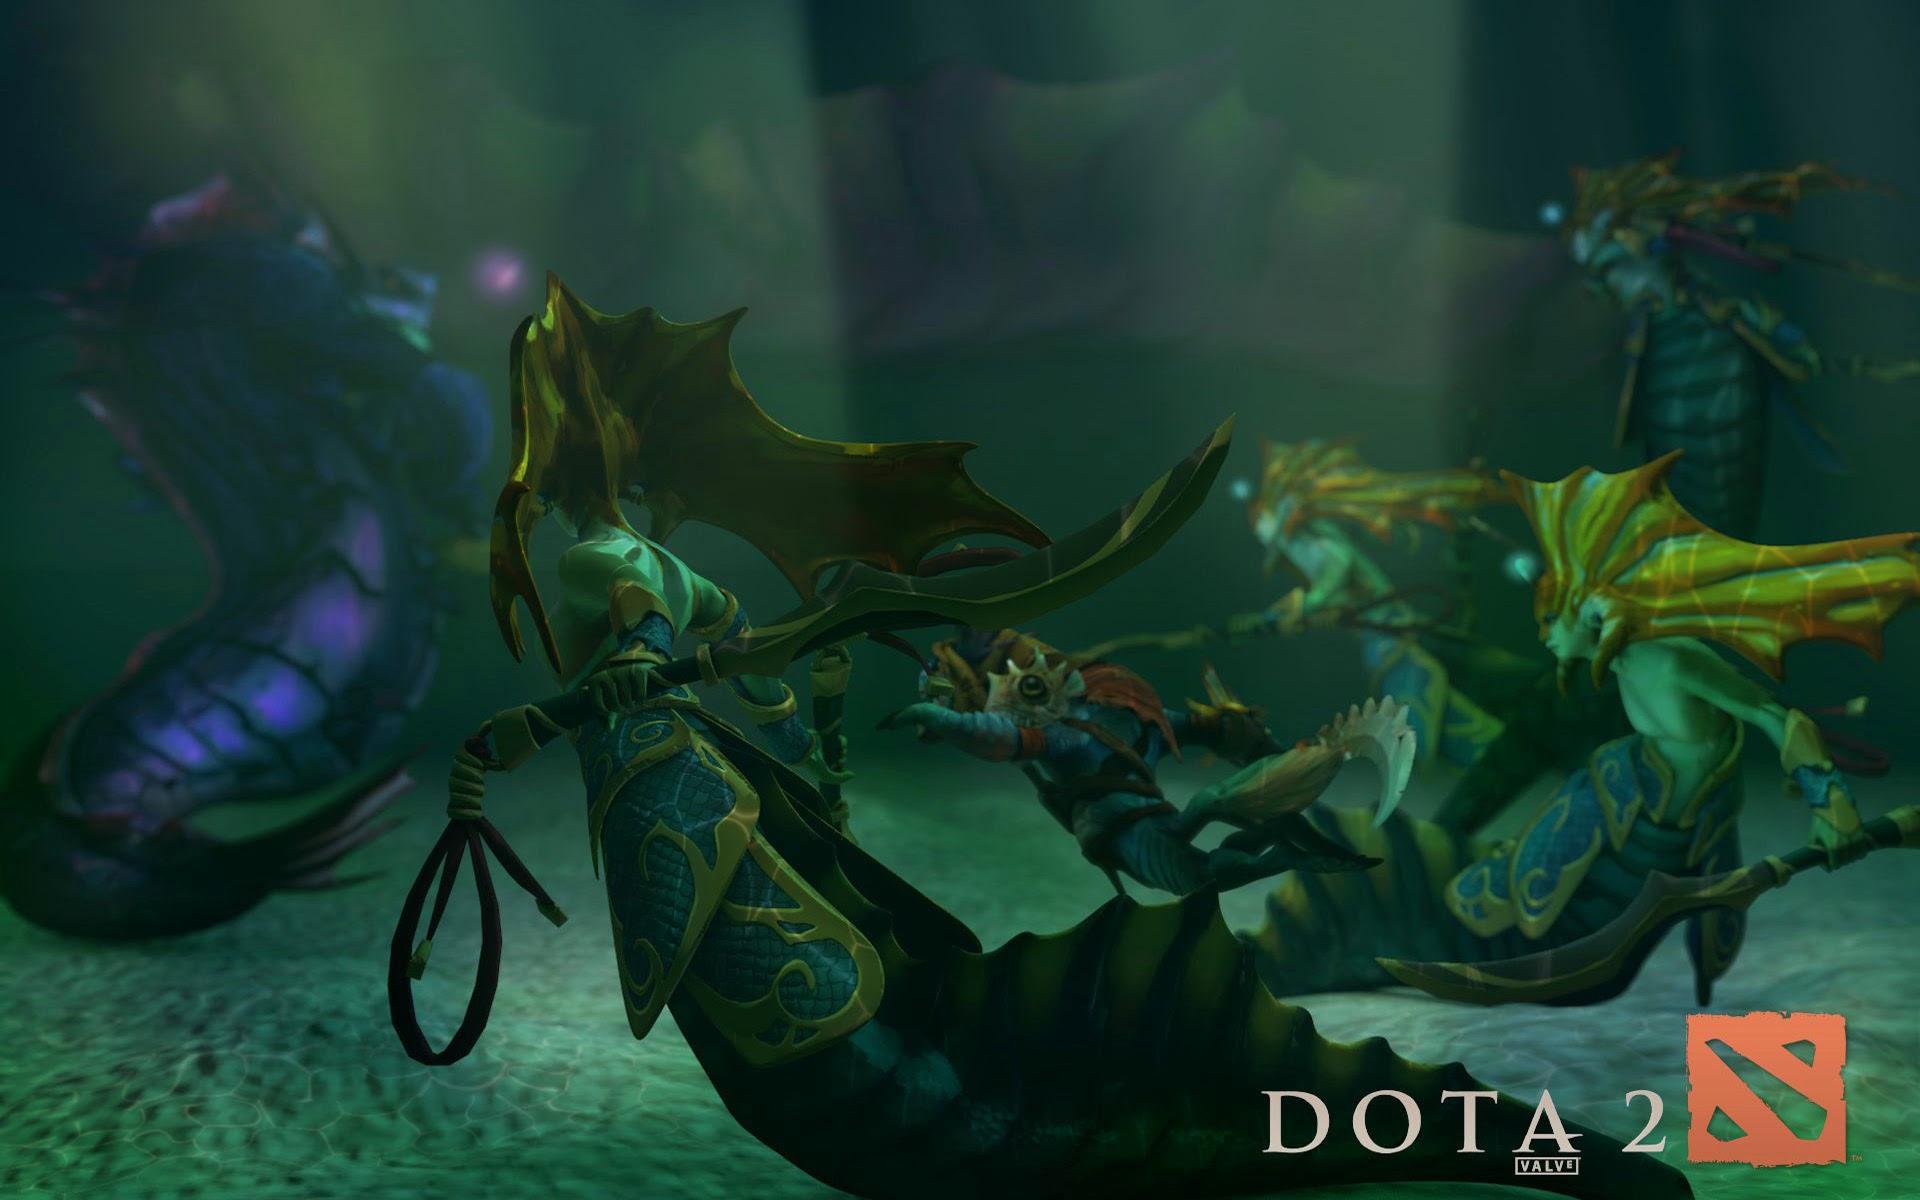 Naga Siren and Slark 9g Wallpaper HD